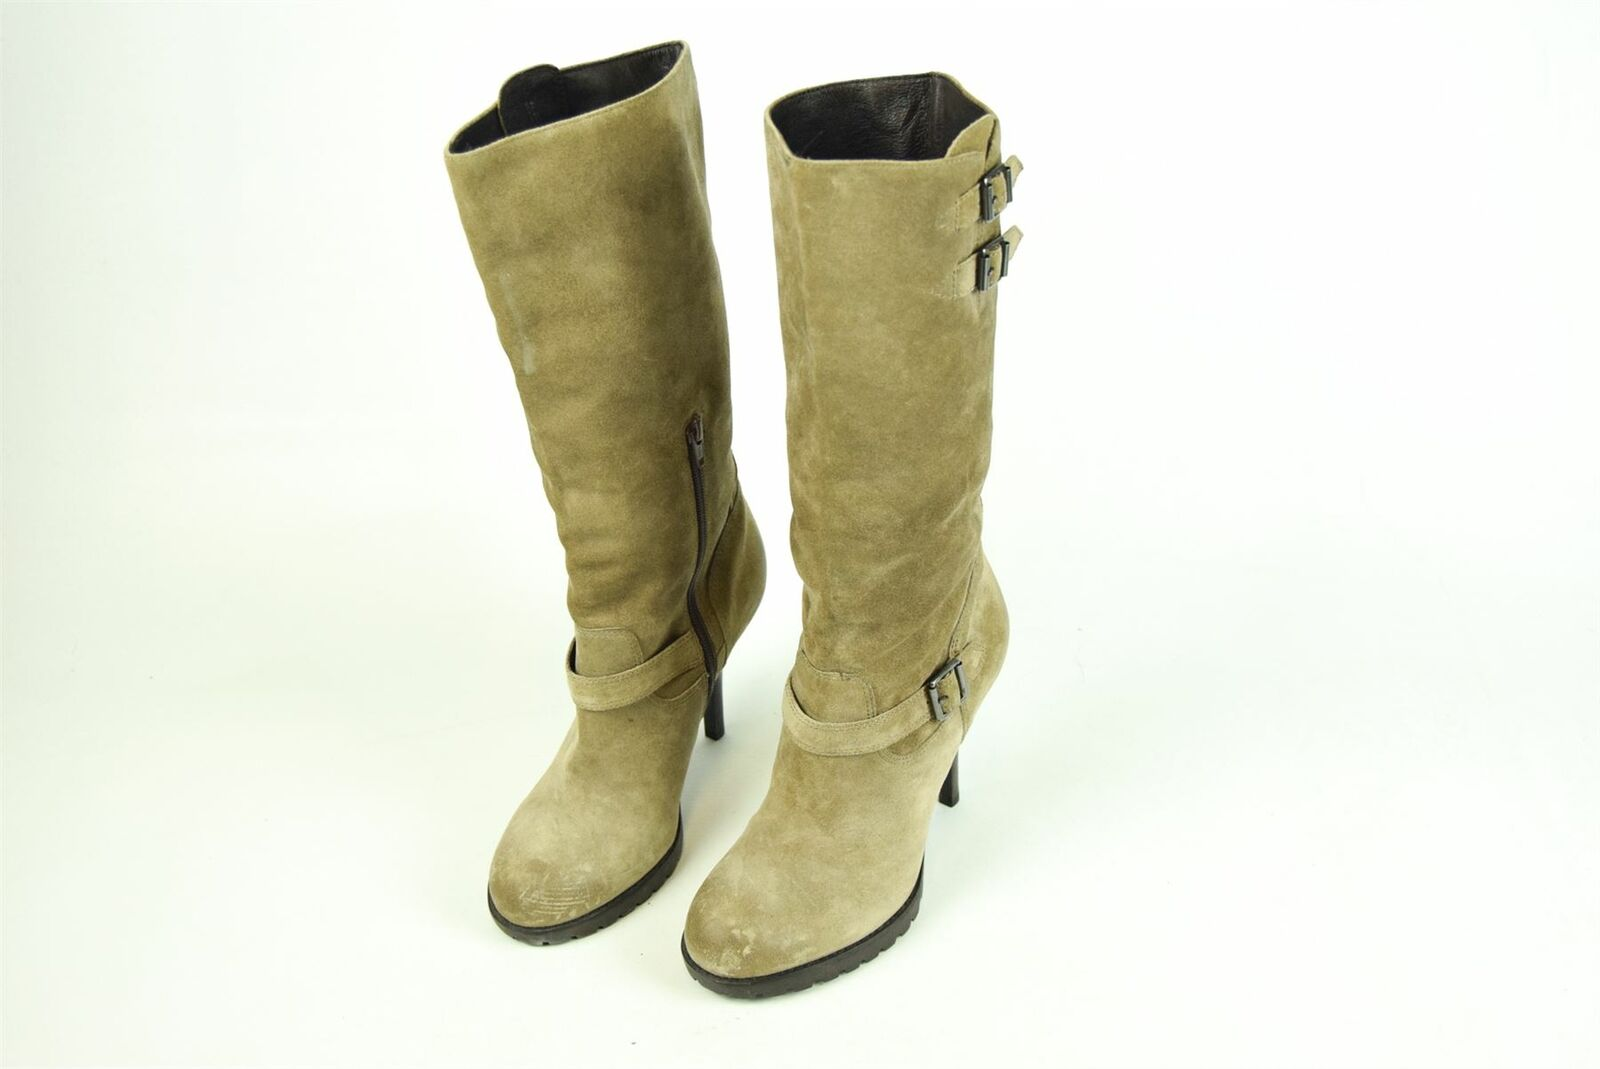 ASH Taupe Suede Heeled Boots, UK 6 US 9 EU 39 HEEL 4.25